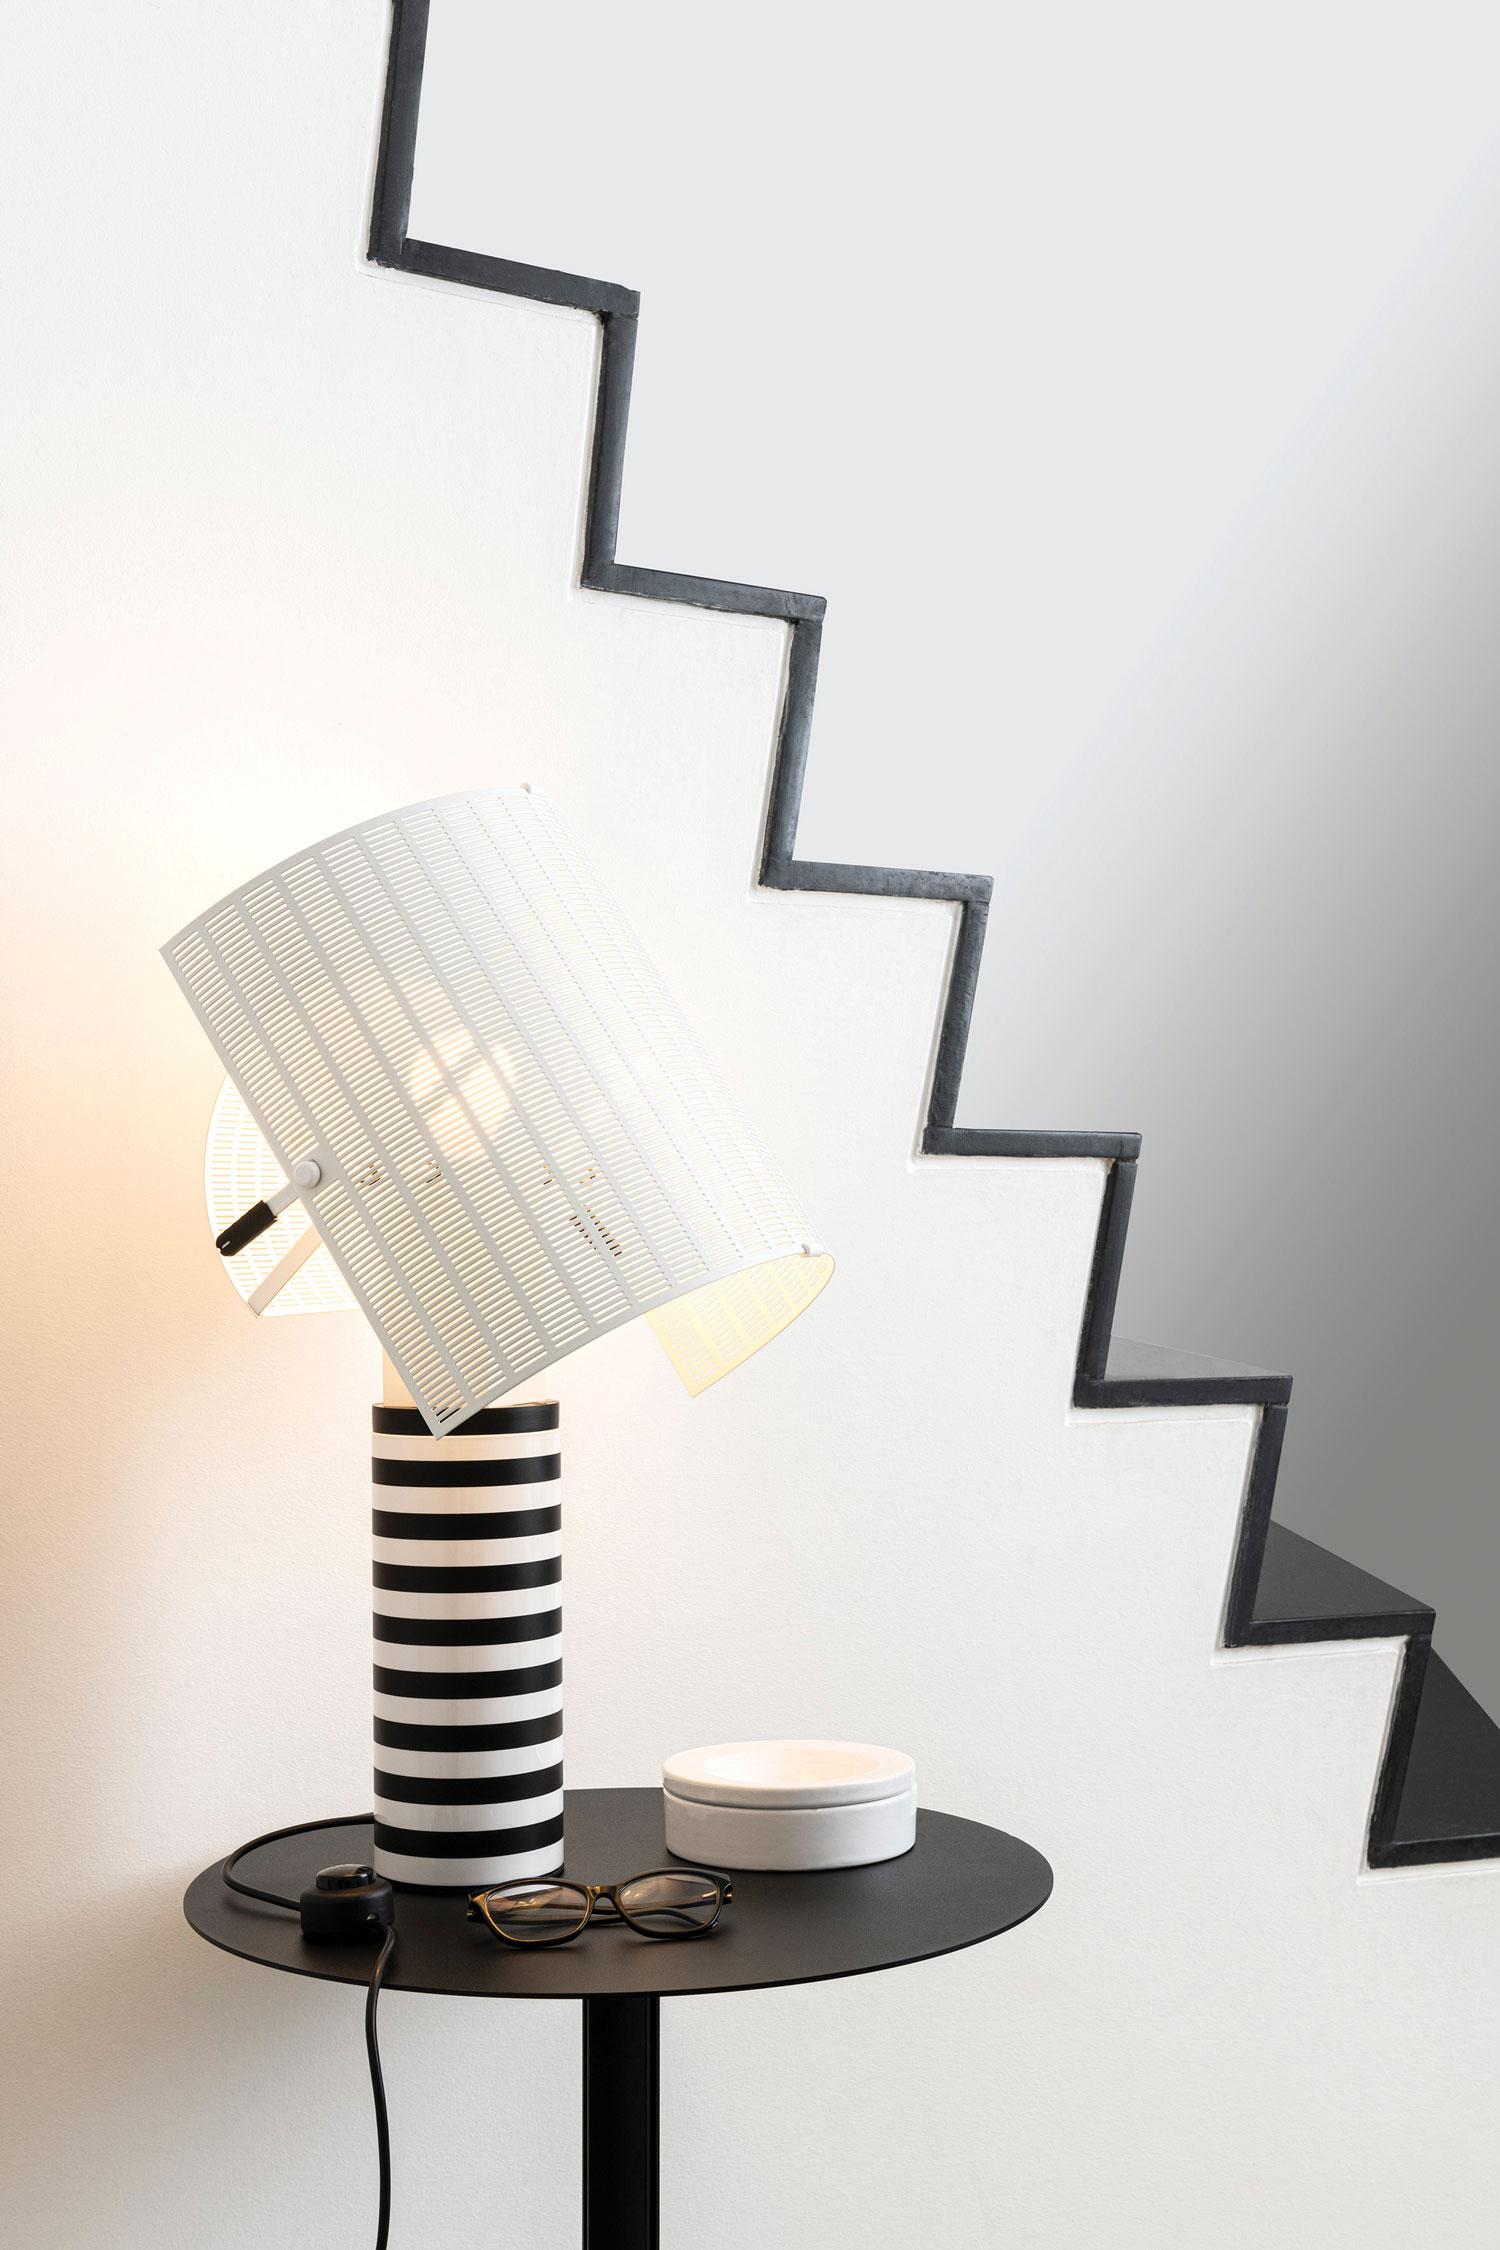 Artemide Shogun Lamp Stylecraft Yellowtrace